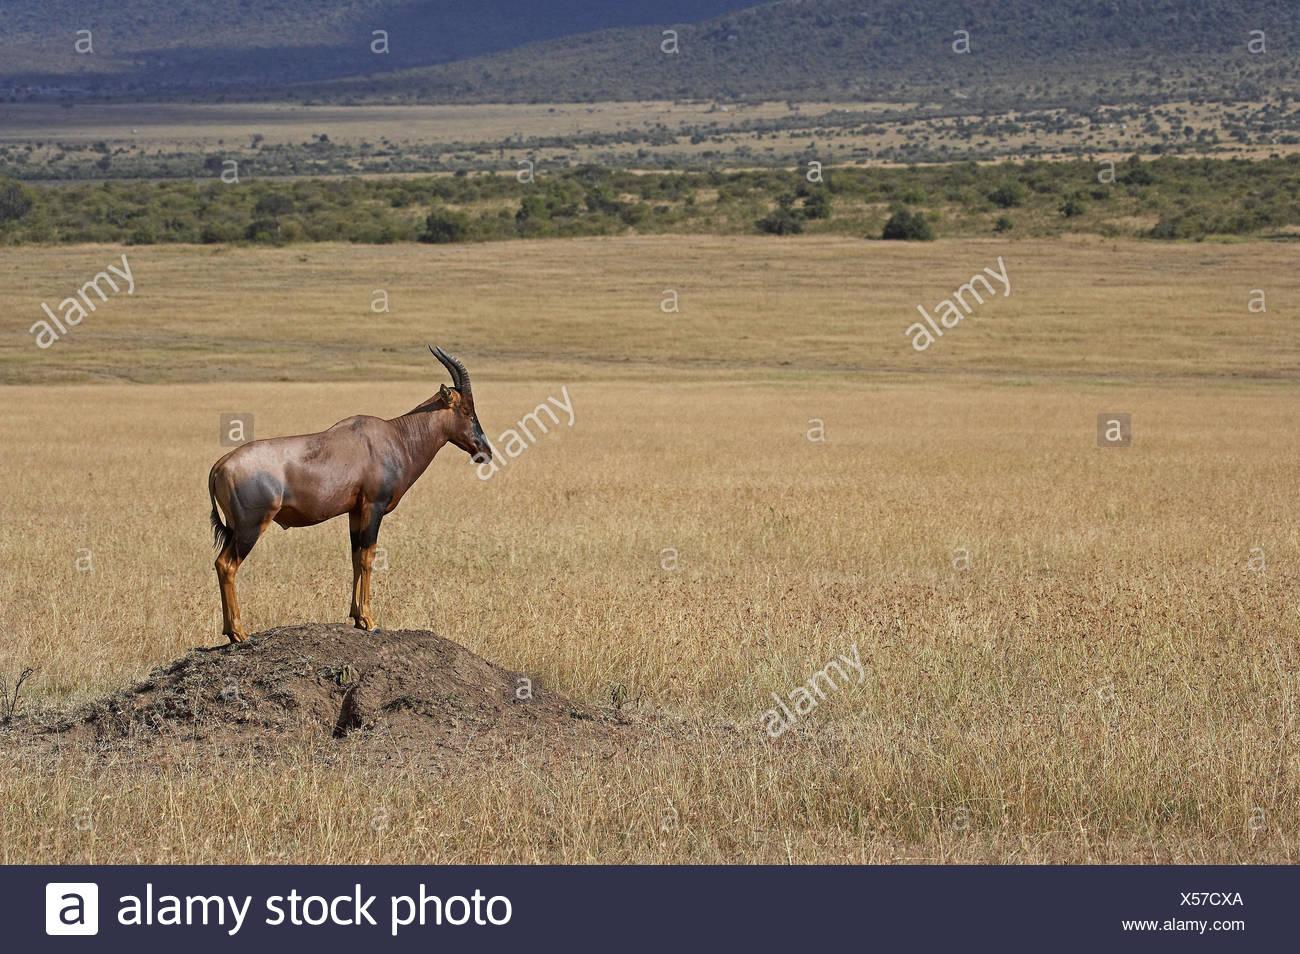 Lyre antelope, Damaliscus korrigum, adult animal, stand, termite hill, Masai Mara Park, Kenya, - Stock Image